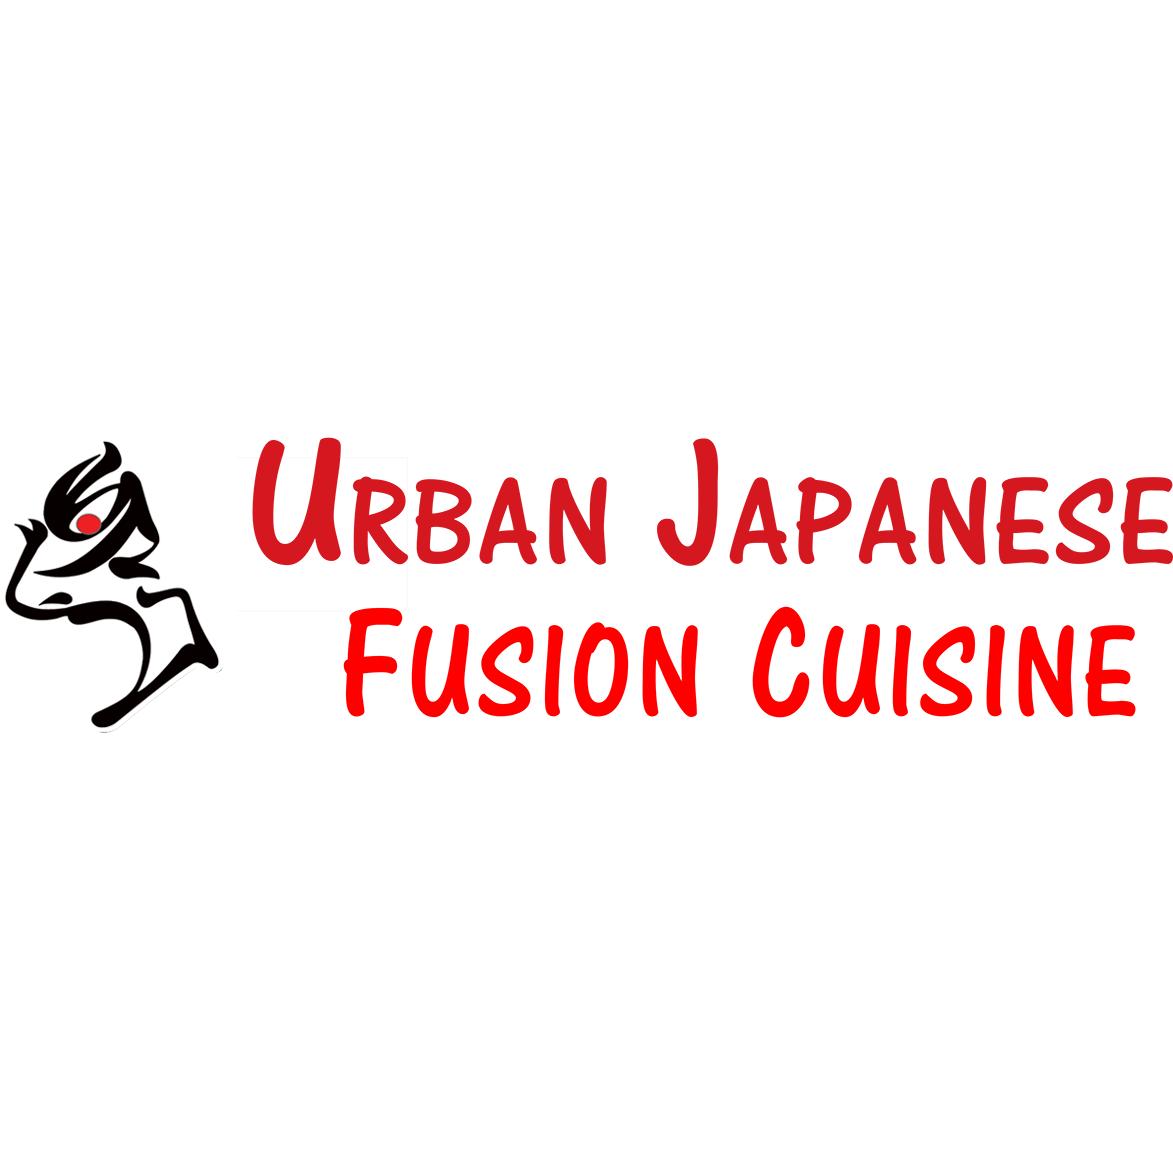 Urban Japanese Fusion Cuisine